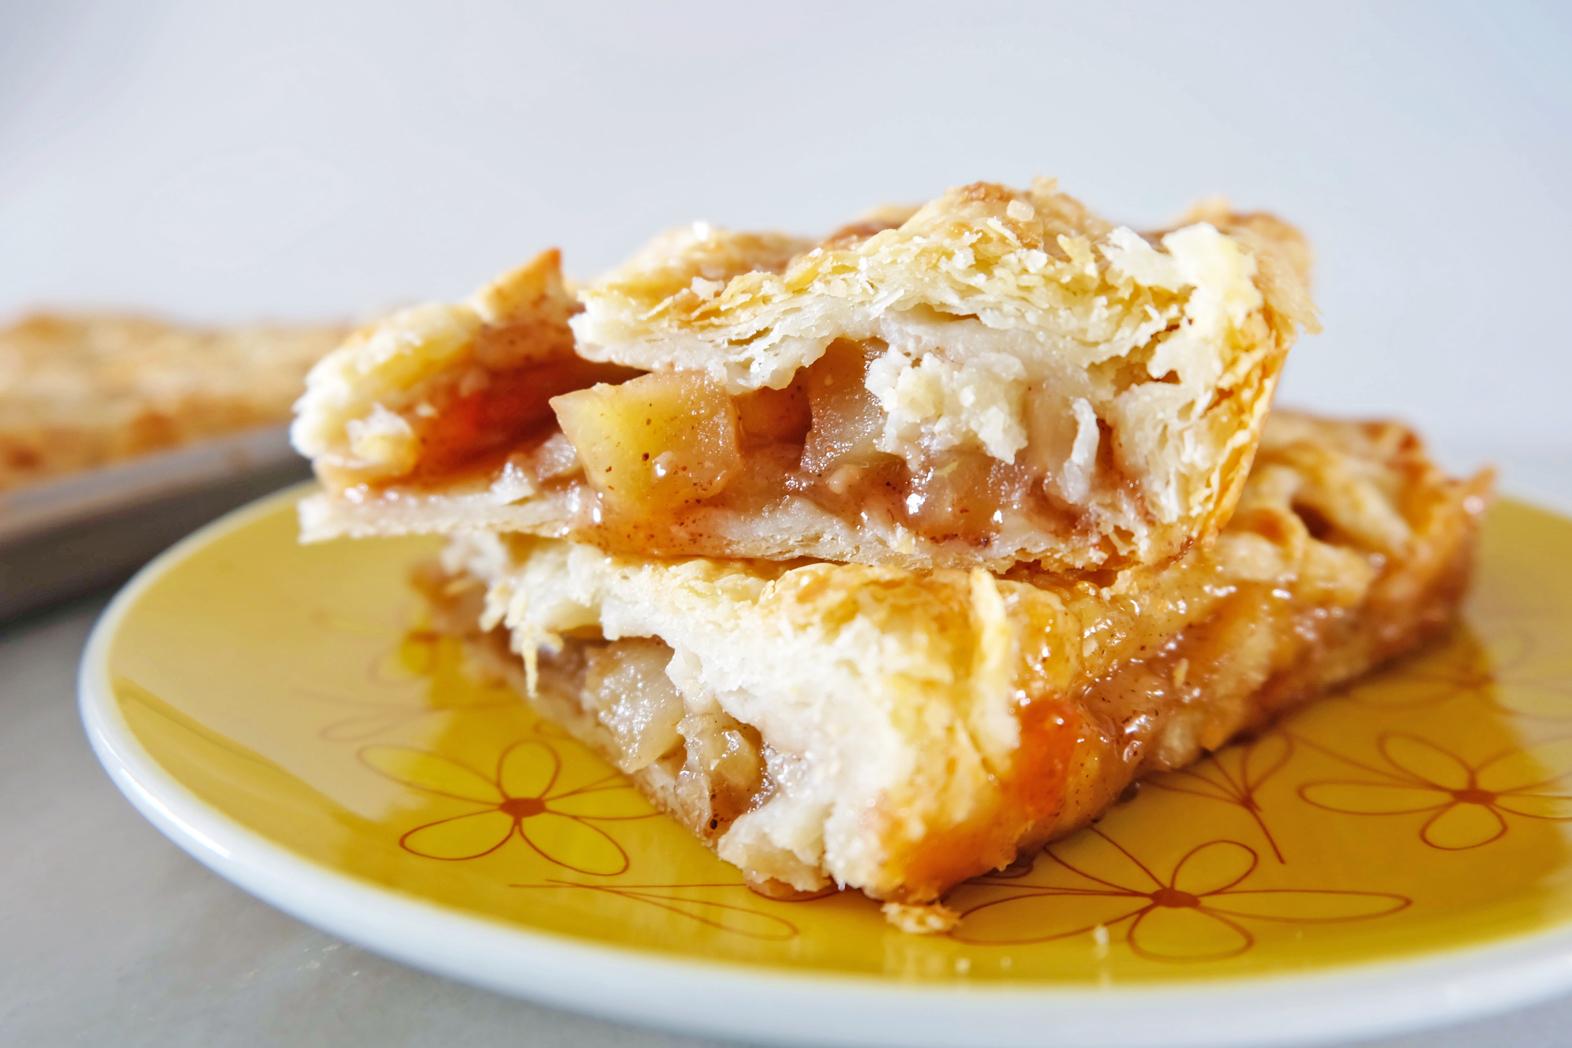 slices of apple slab pie with buttermilk crust